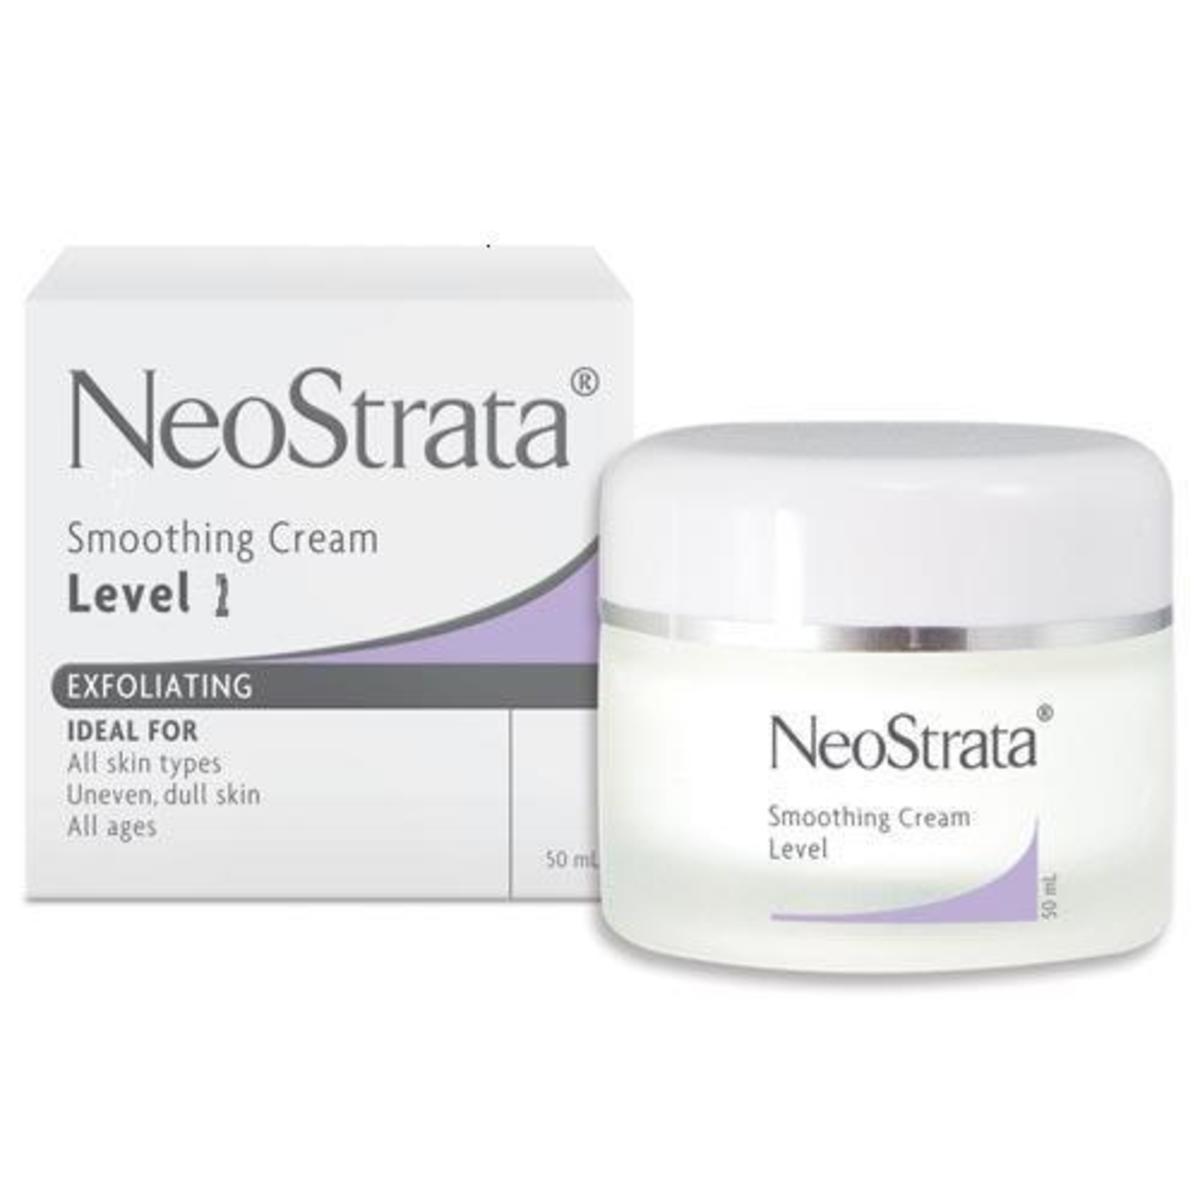 NeoStrata-Smoothing-Cream